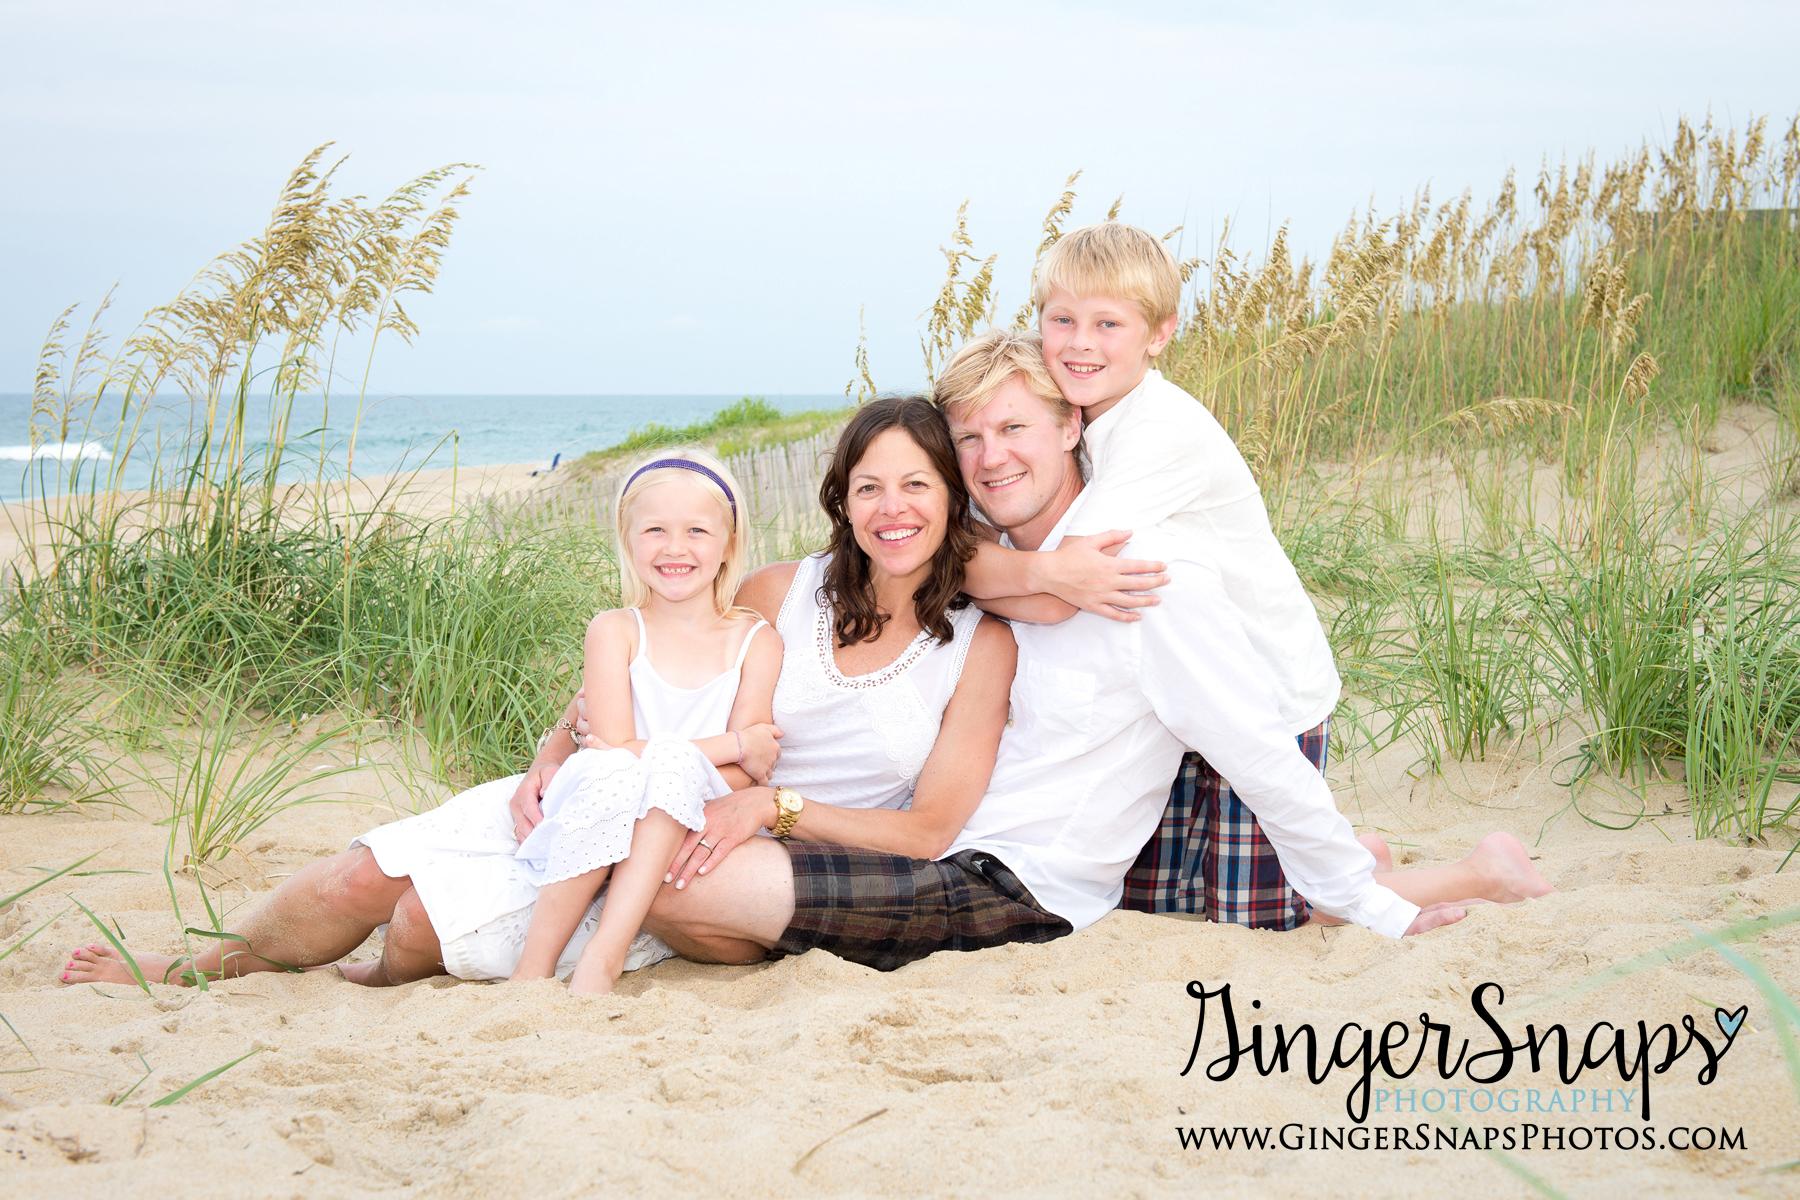 GingerSnaps Photography - 14.jpg